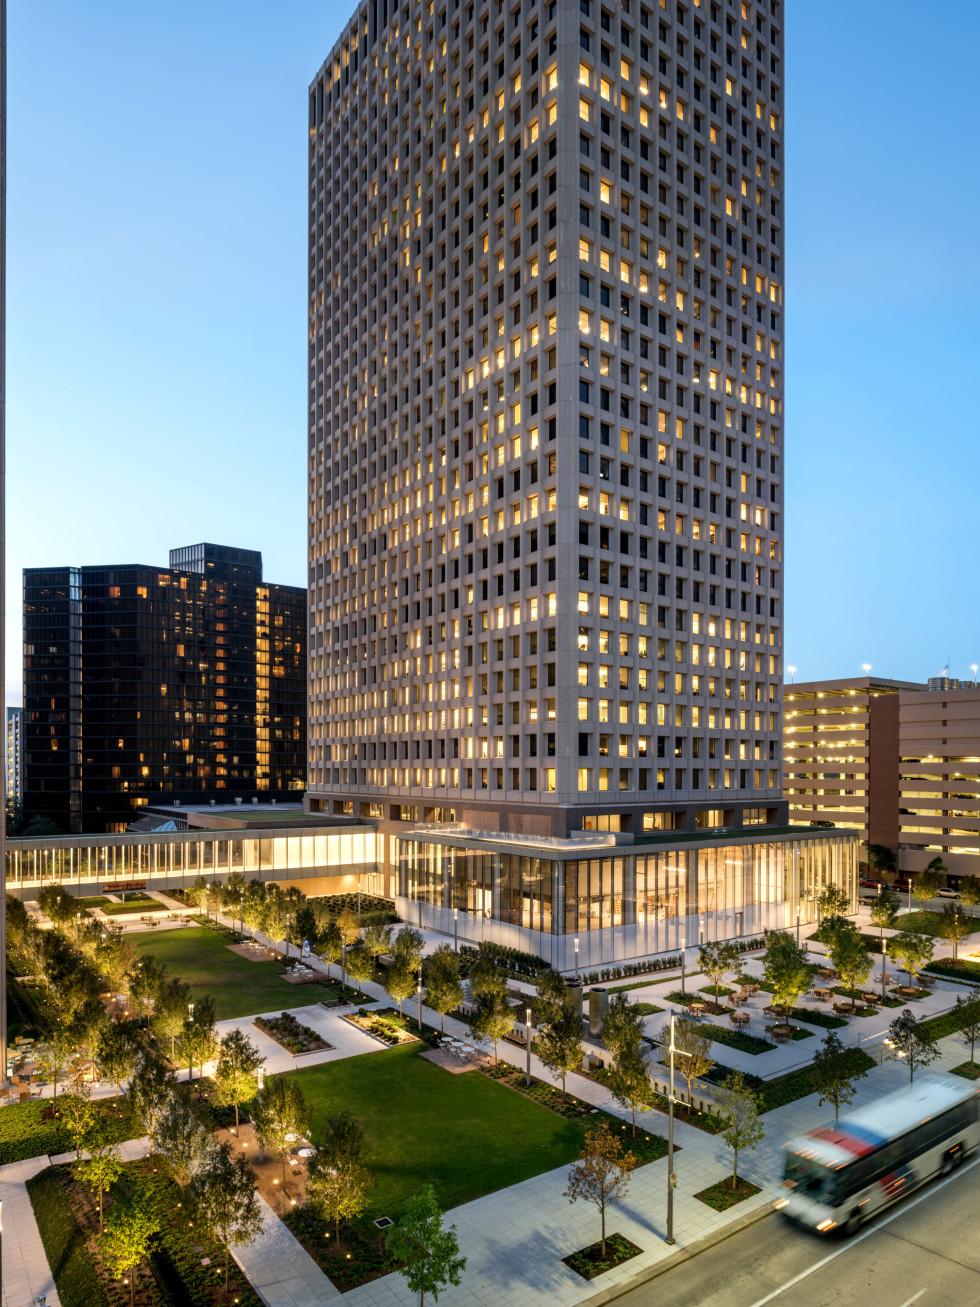 C. Baldwin Hotel Allen Center downtown Houston - vertical